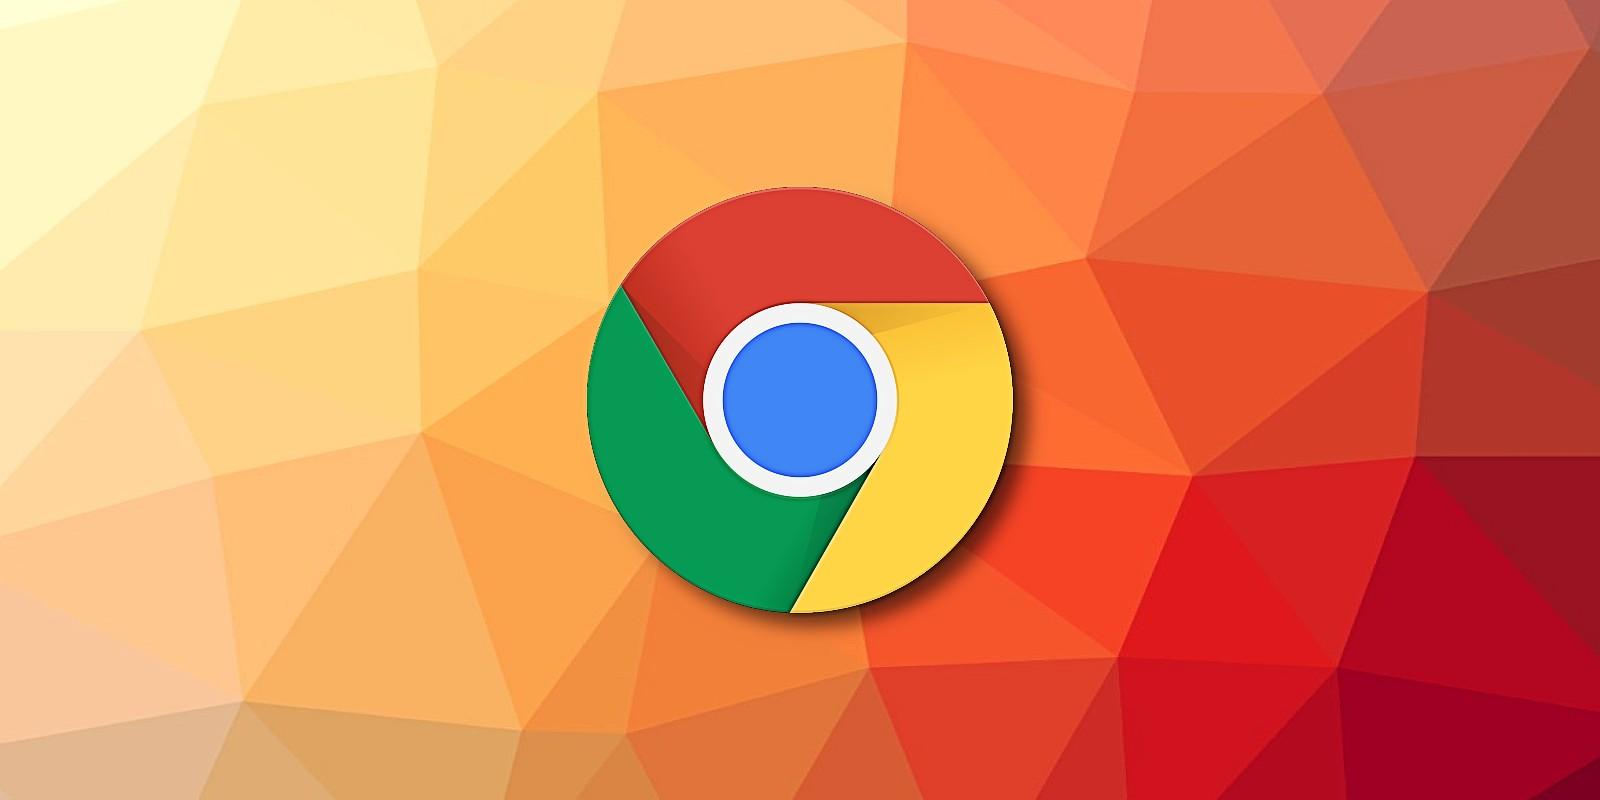 Версия Chrome 88 перейдет на поддержку Manifest V3